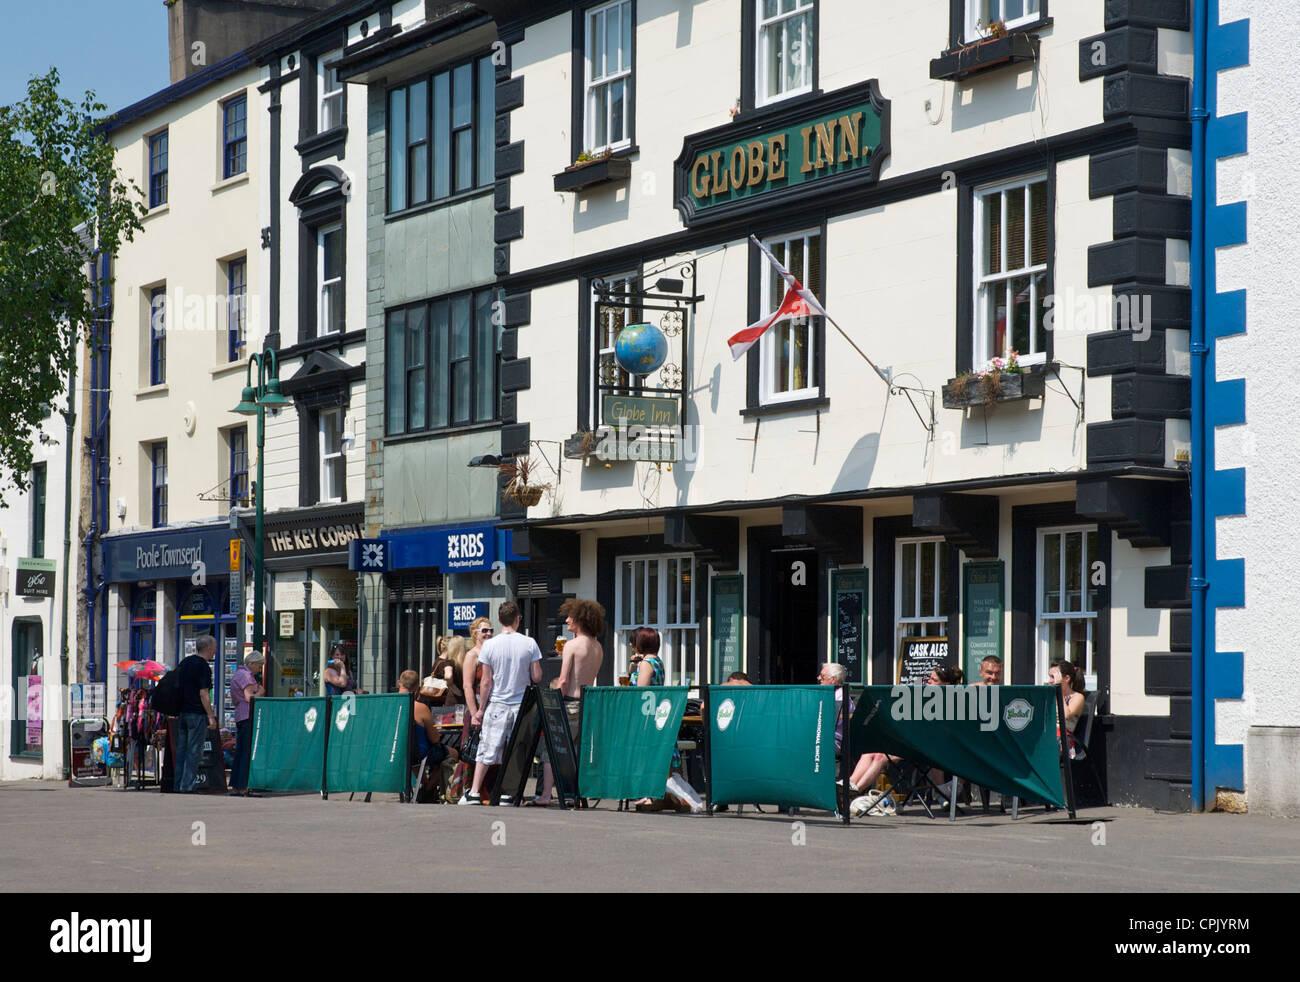 People drinking outside the Globe Inn, Market Place, Kendal, Cumbria, England UK Stock Photo